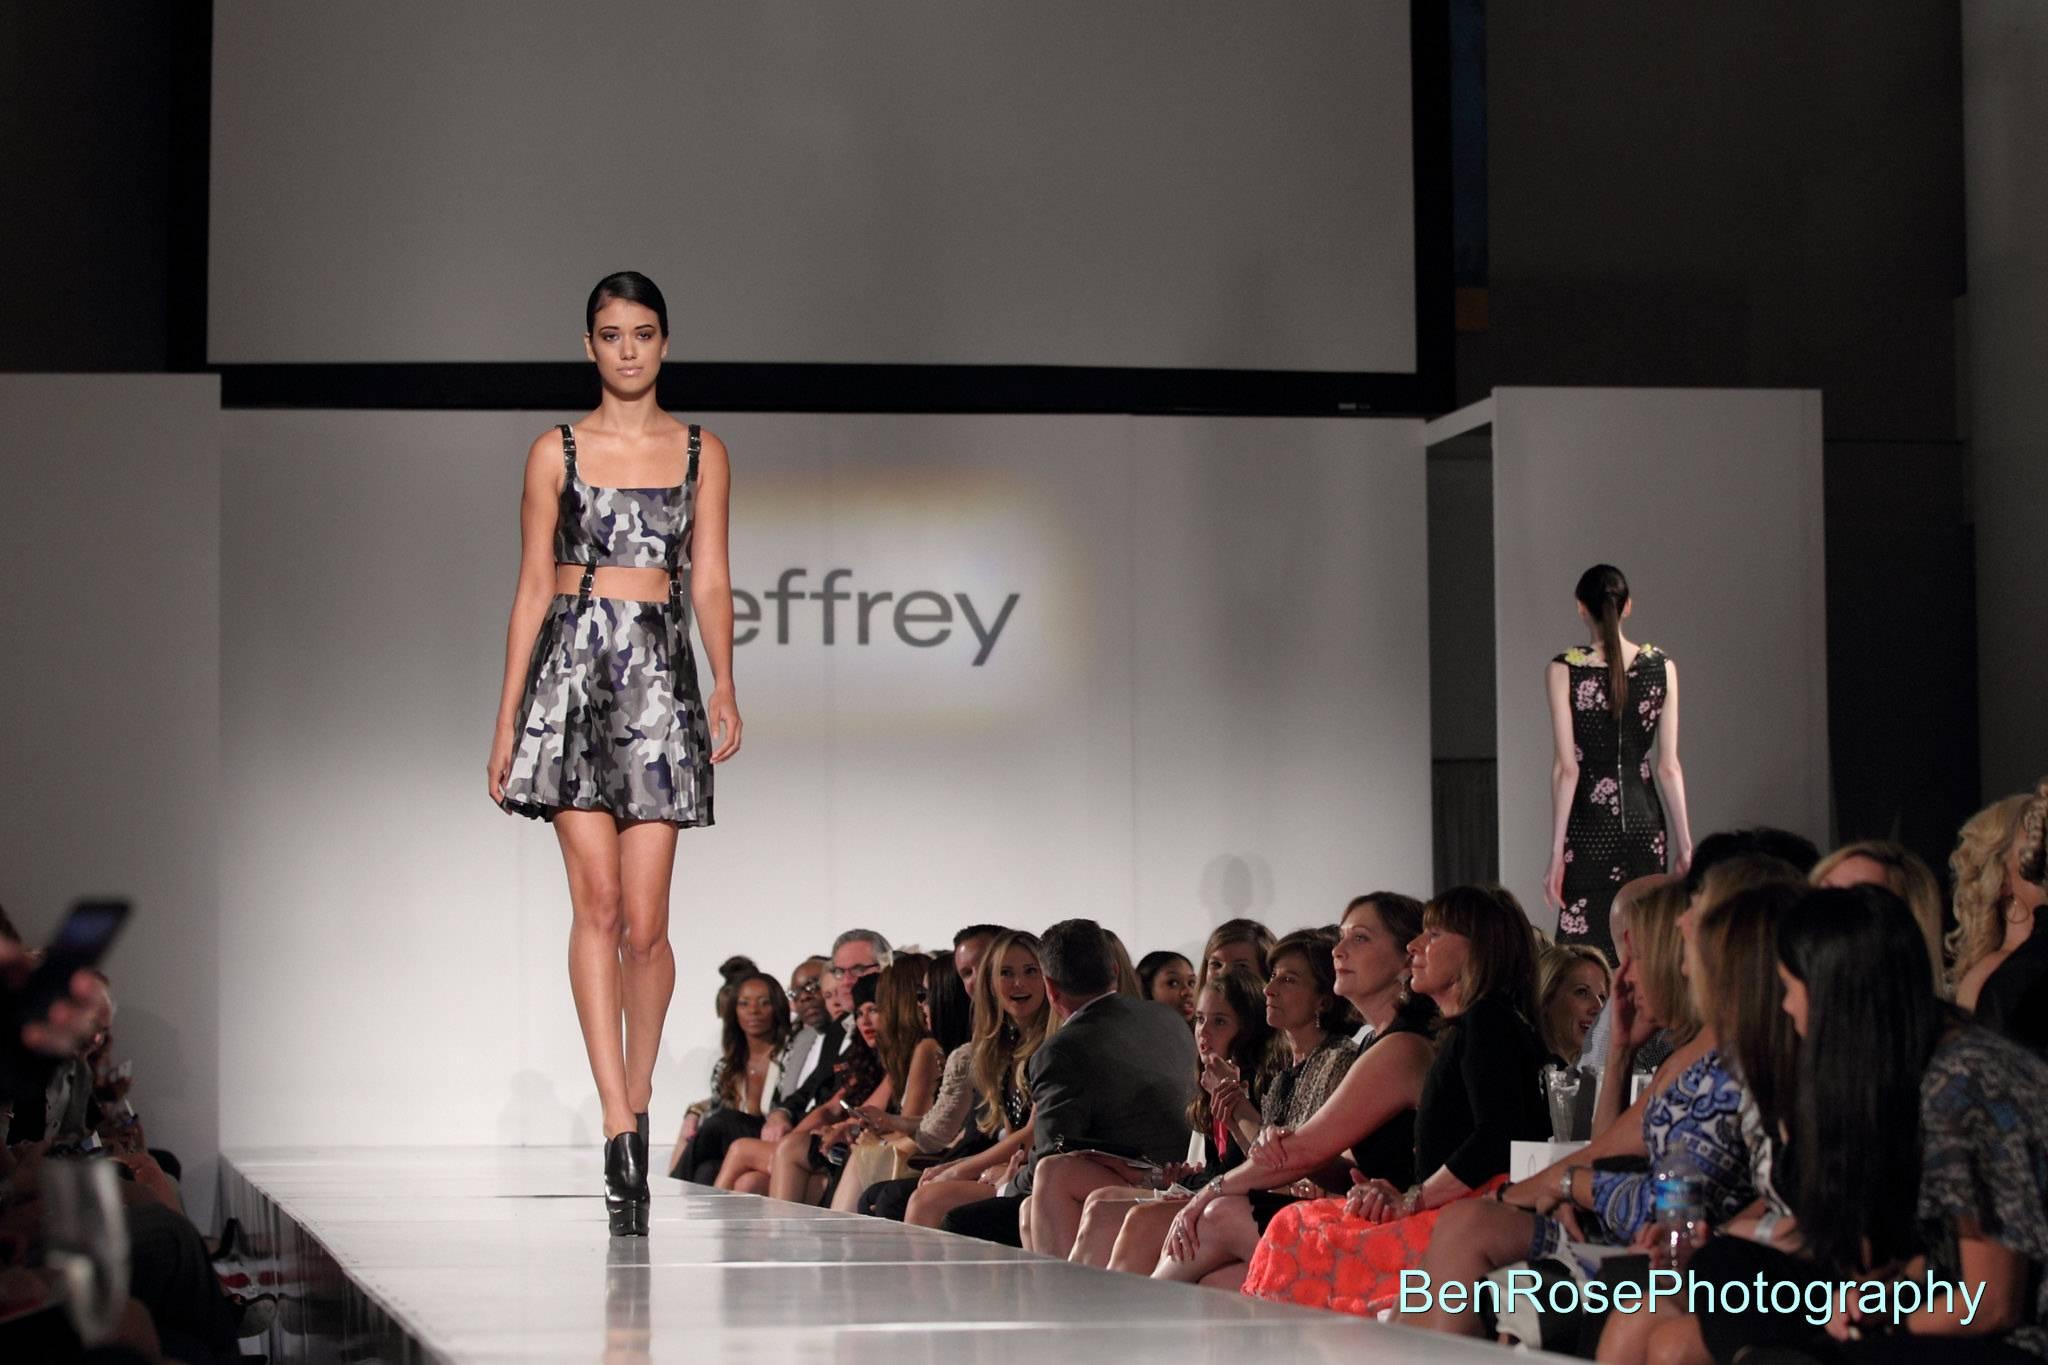 2013 Jeffrey Fashion Cares Photo by Ben Rose  www.BenRosePhotography.com